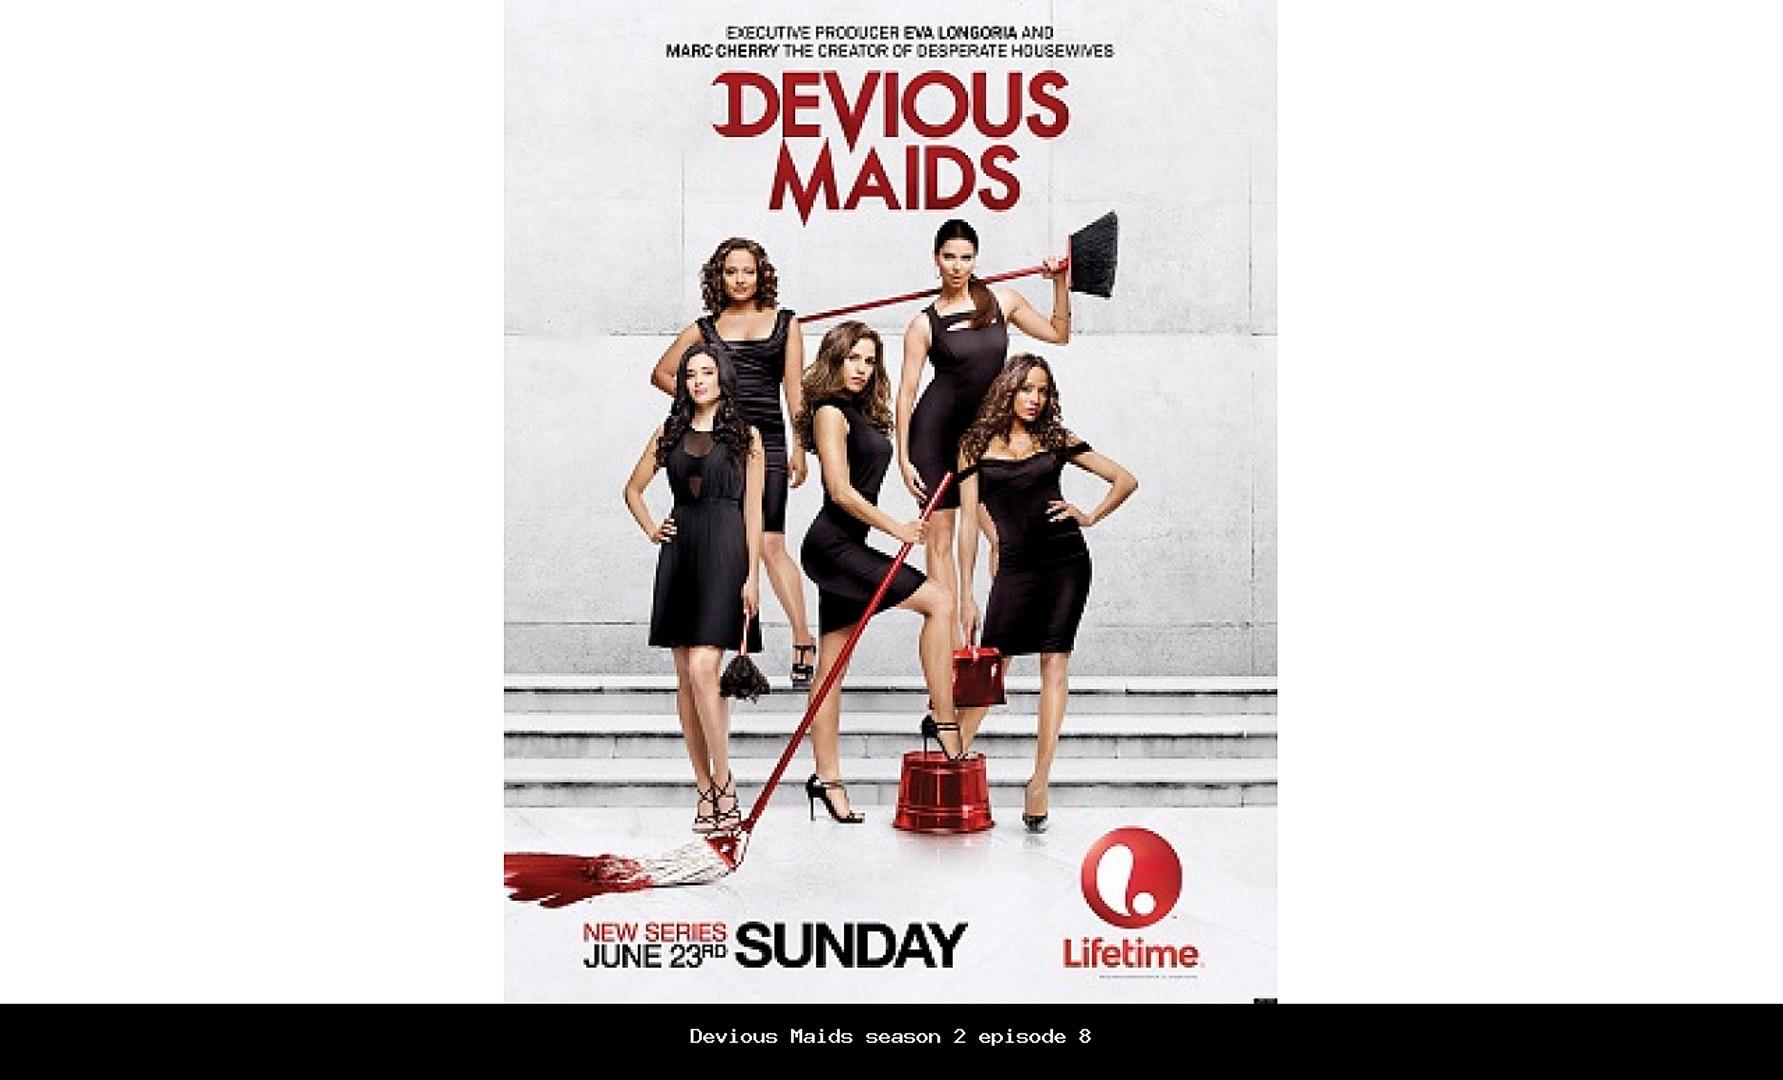 devious maids season 2 online free